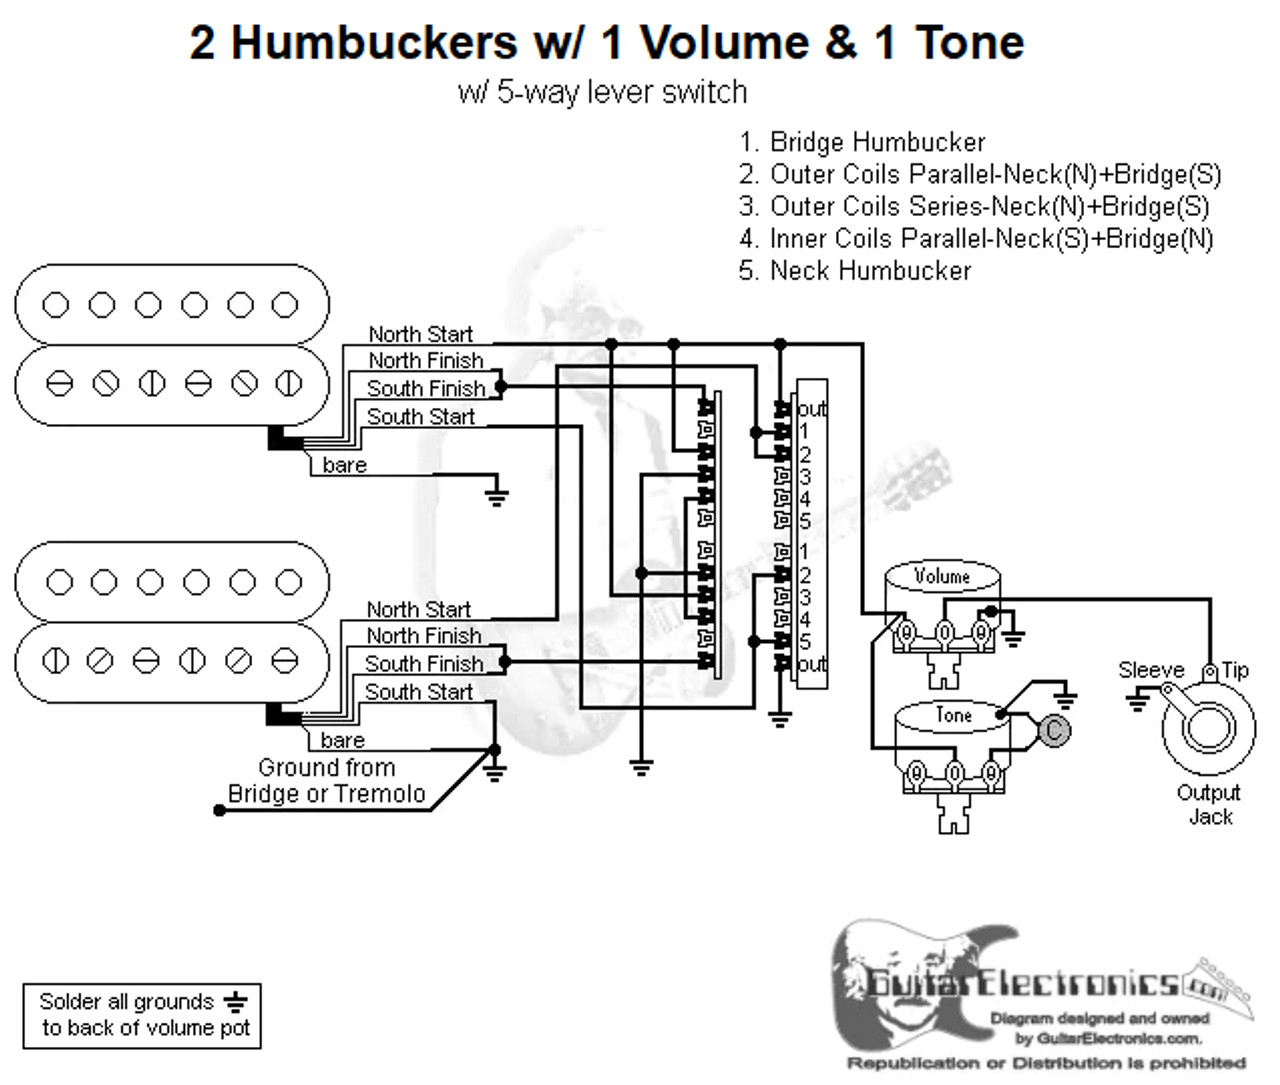 Fender Strat Wiring Diagram 2 Humbucker 5 Way Switch ... on coil tap wiring-diagram, seymour duncan blackouts wiring-diagram, les paul 50s wiring-diagram, dragonfire pickups wiring-diagram, seymour duncan p-rails wiring-diagram, seymour duncan liberator wiring-diagram, goodman mini split wiring-diagram, dimarzio super distortion wiring-diagram, dual humbuckers passive, dual voice coil wiring diagram, lg ductless wiring-diagram, telecaster wiring-diagram, stratocaster wiring-diagram, hss coil split wiring-diagram, guitar pickups hss wiring-diagram, les paul jr wiring-diagram,